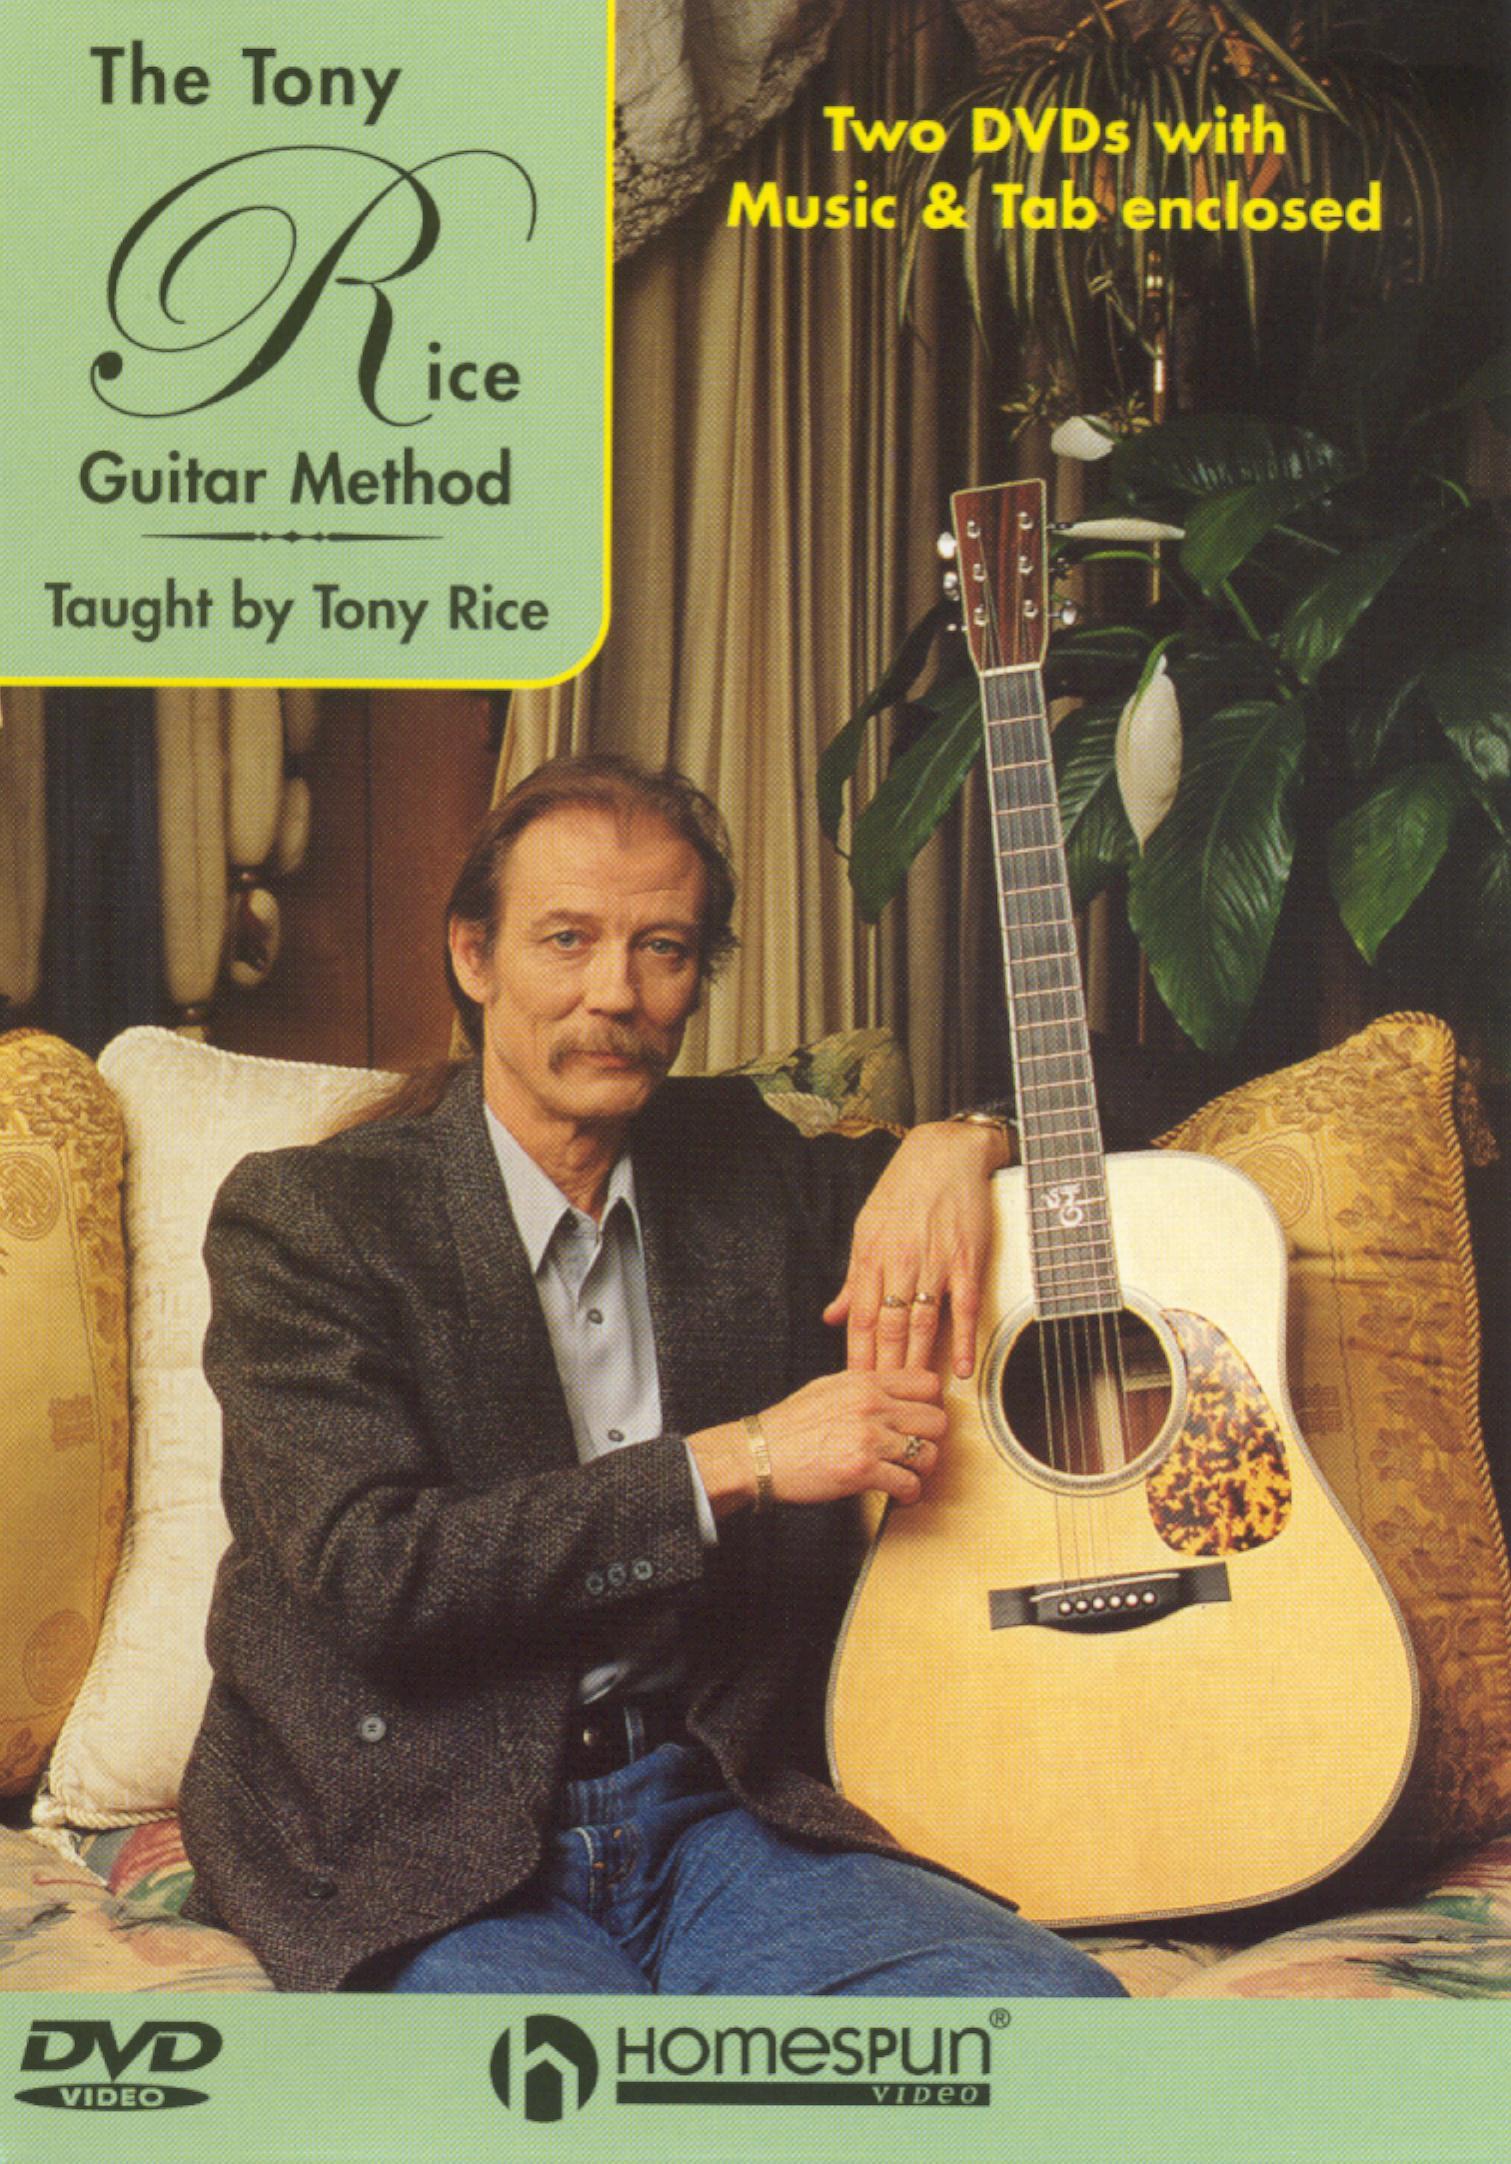 The Tony Rice Guitar Method